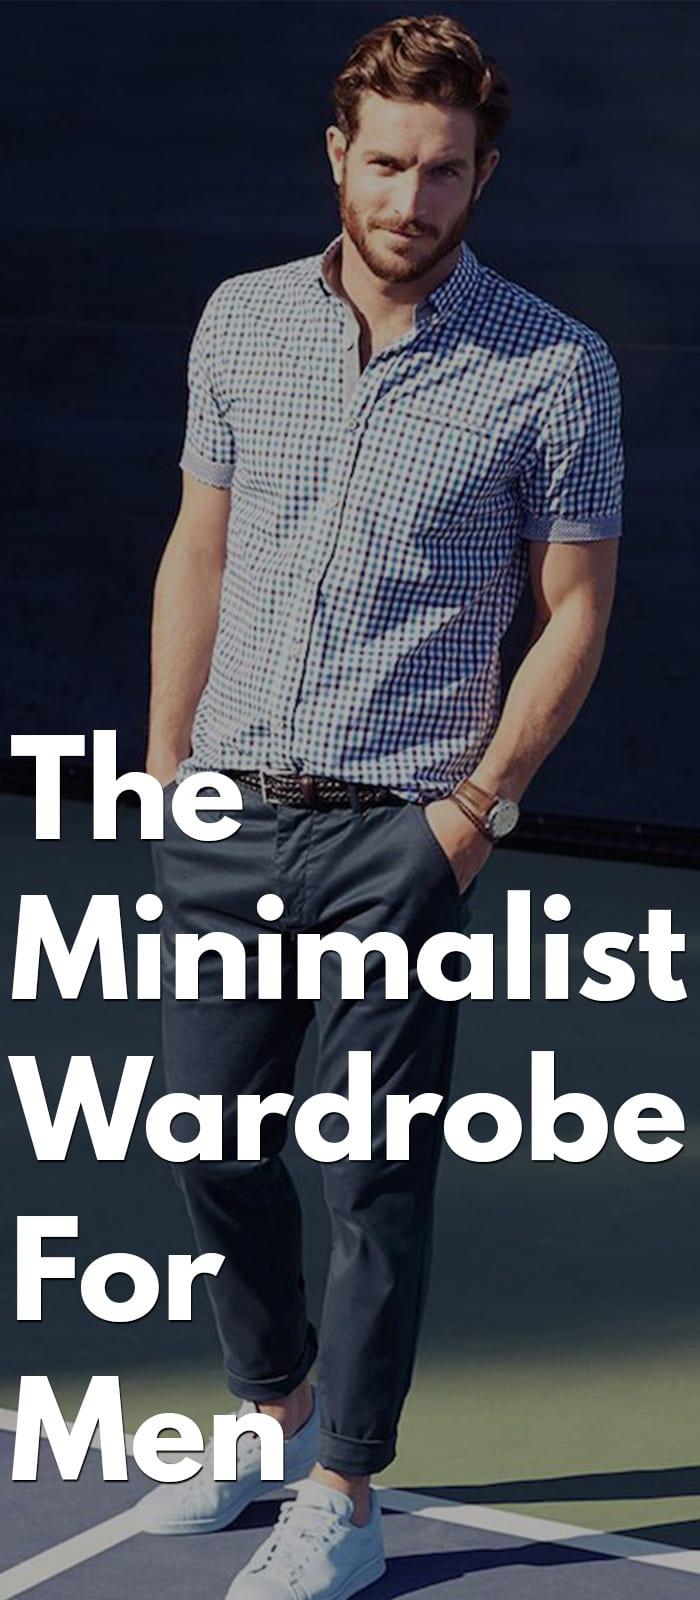 The Minimalist Wardrobe For Men